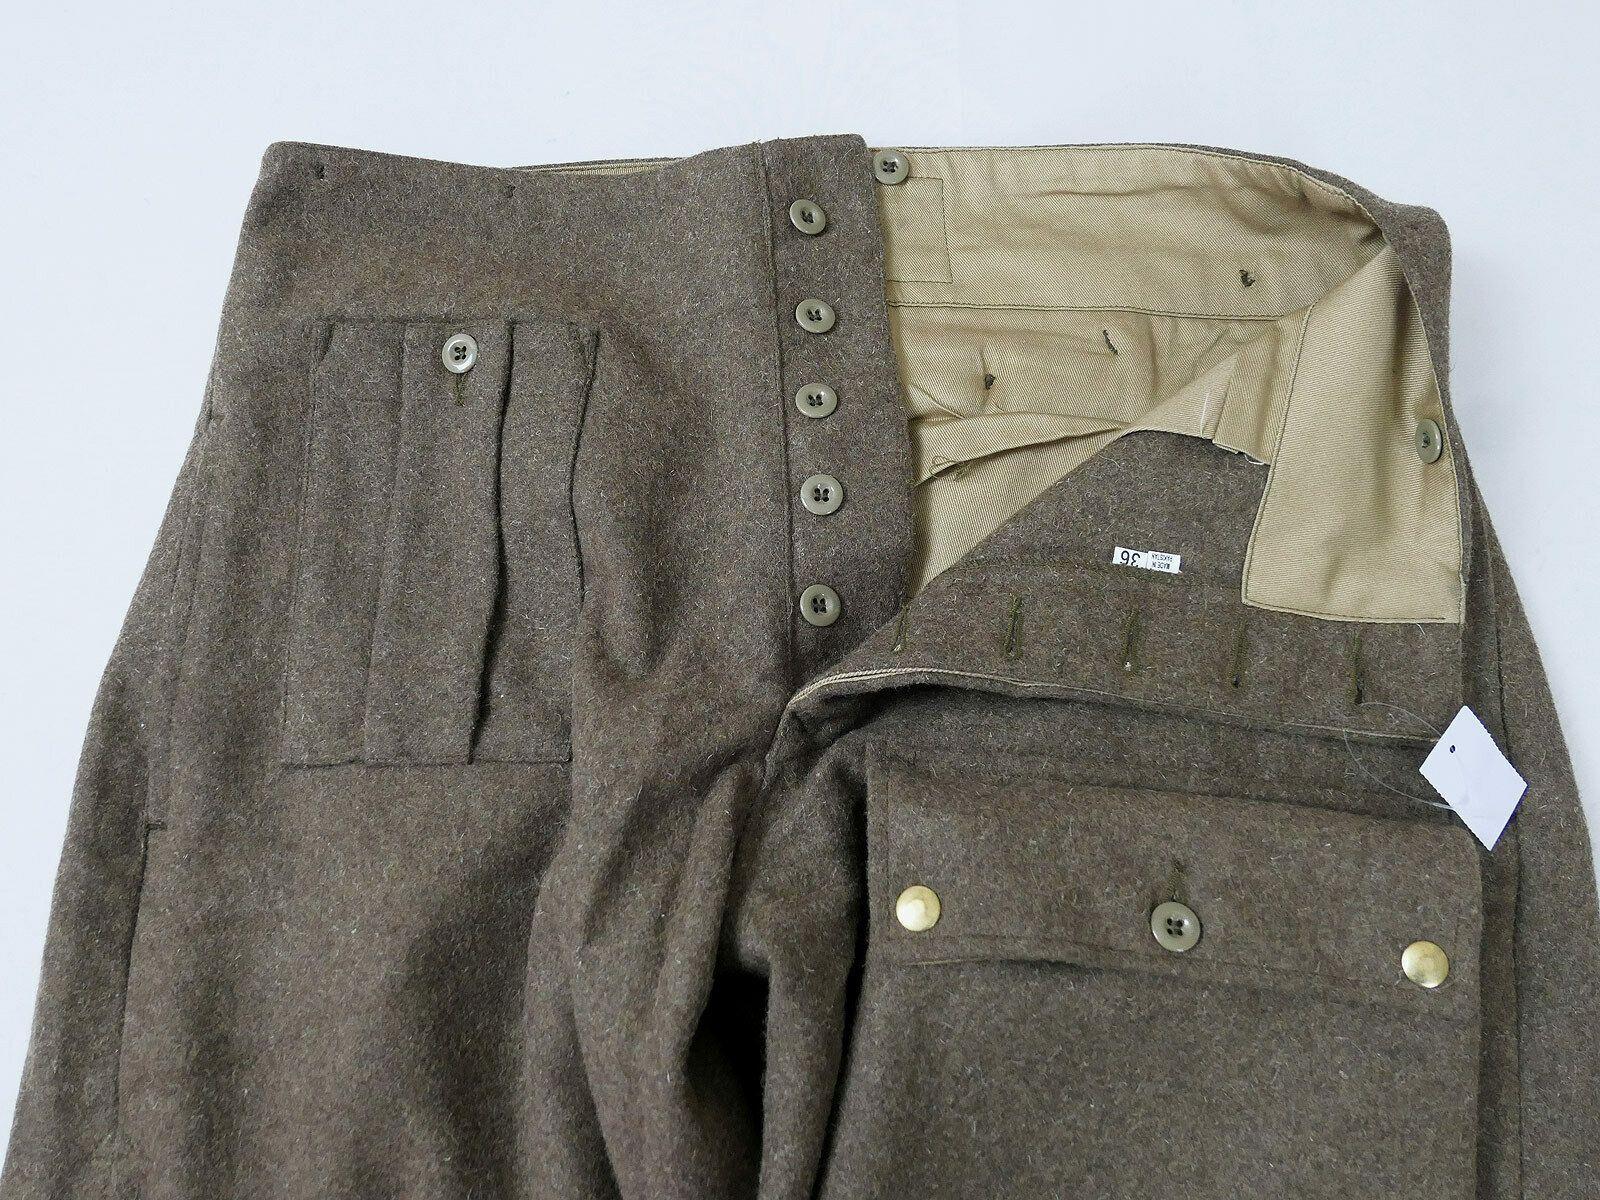 British WWII Battle dress Para Trousers